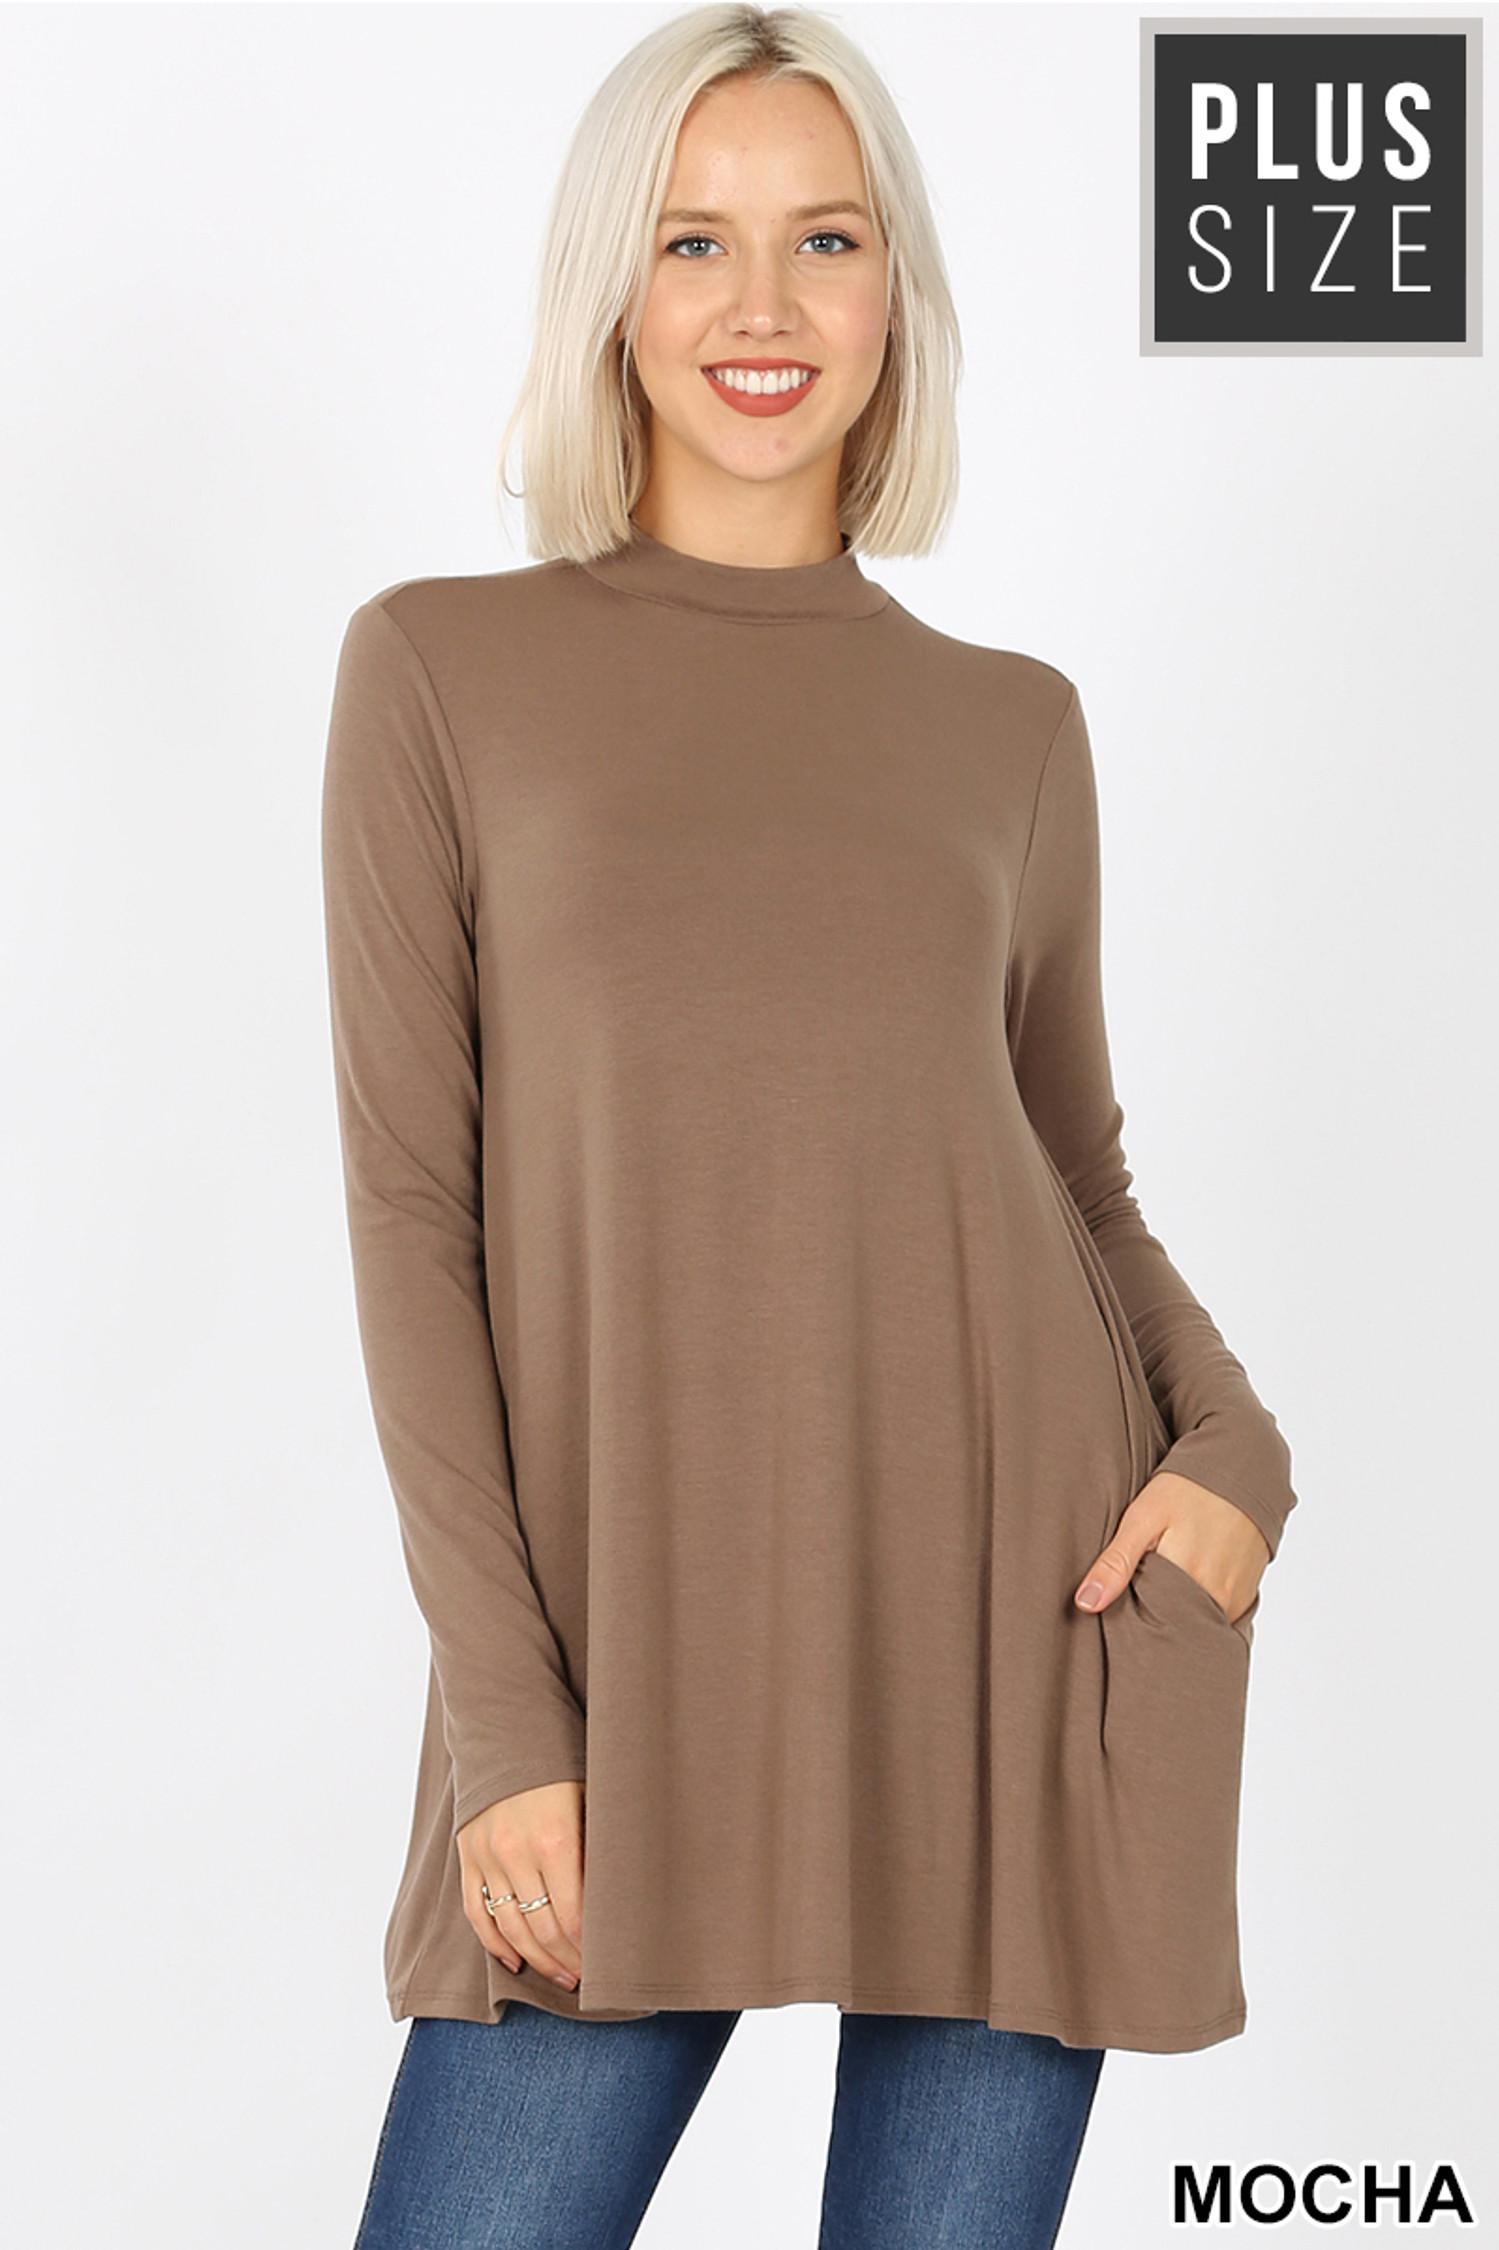 Front image of Mocha Long Sleeve Mock Neck Plus Size Top